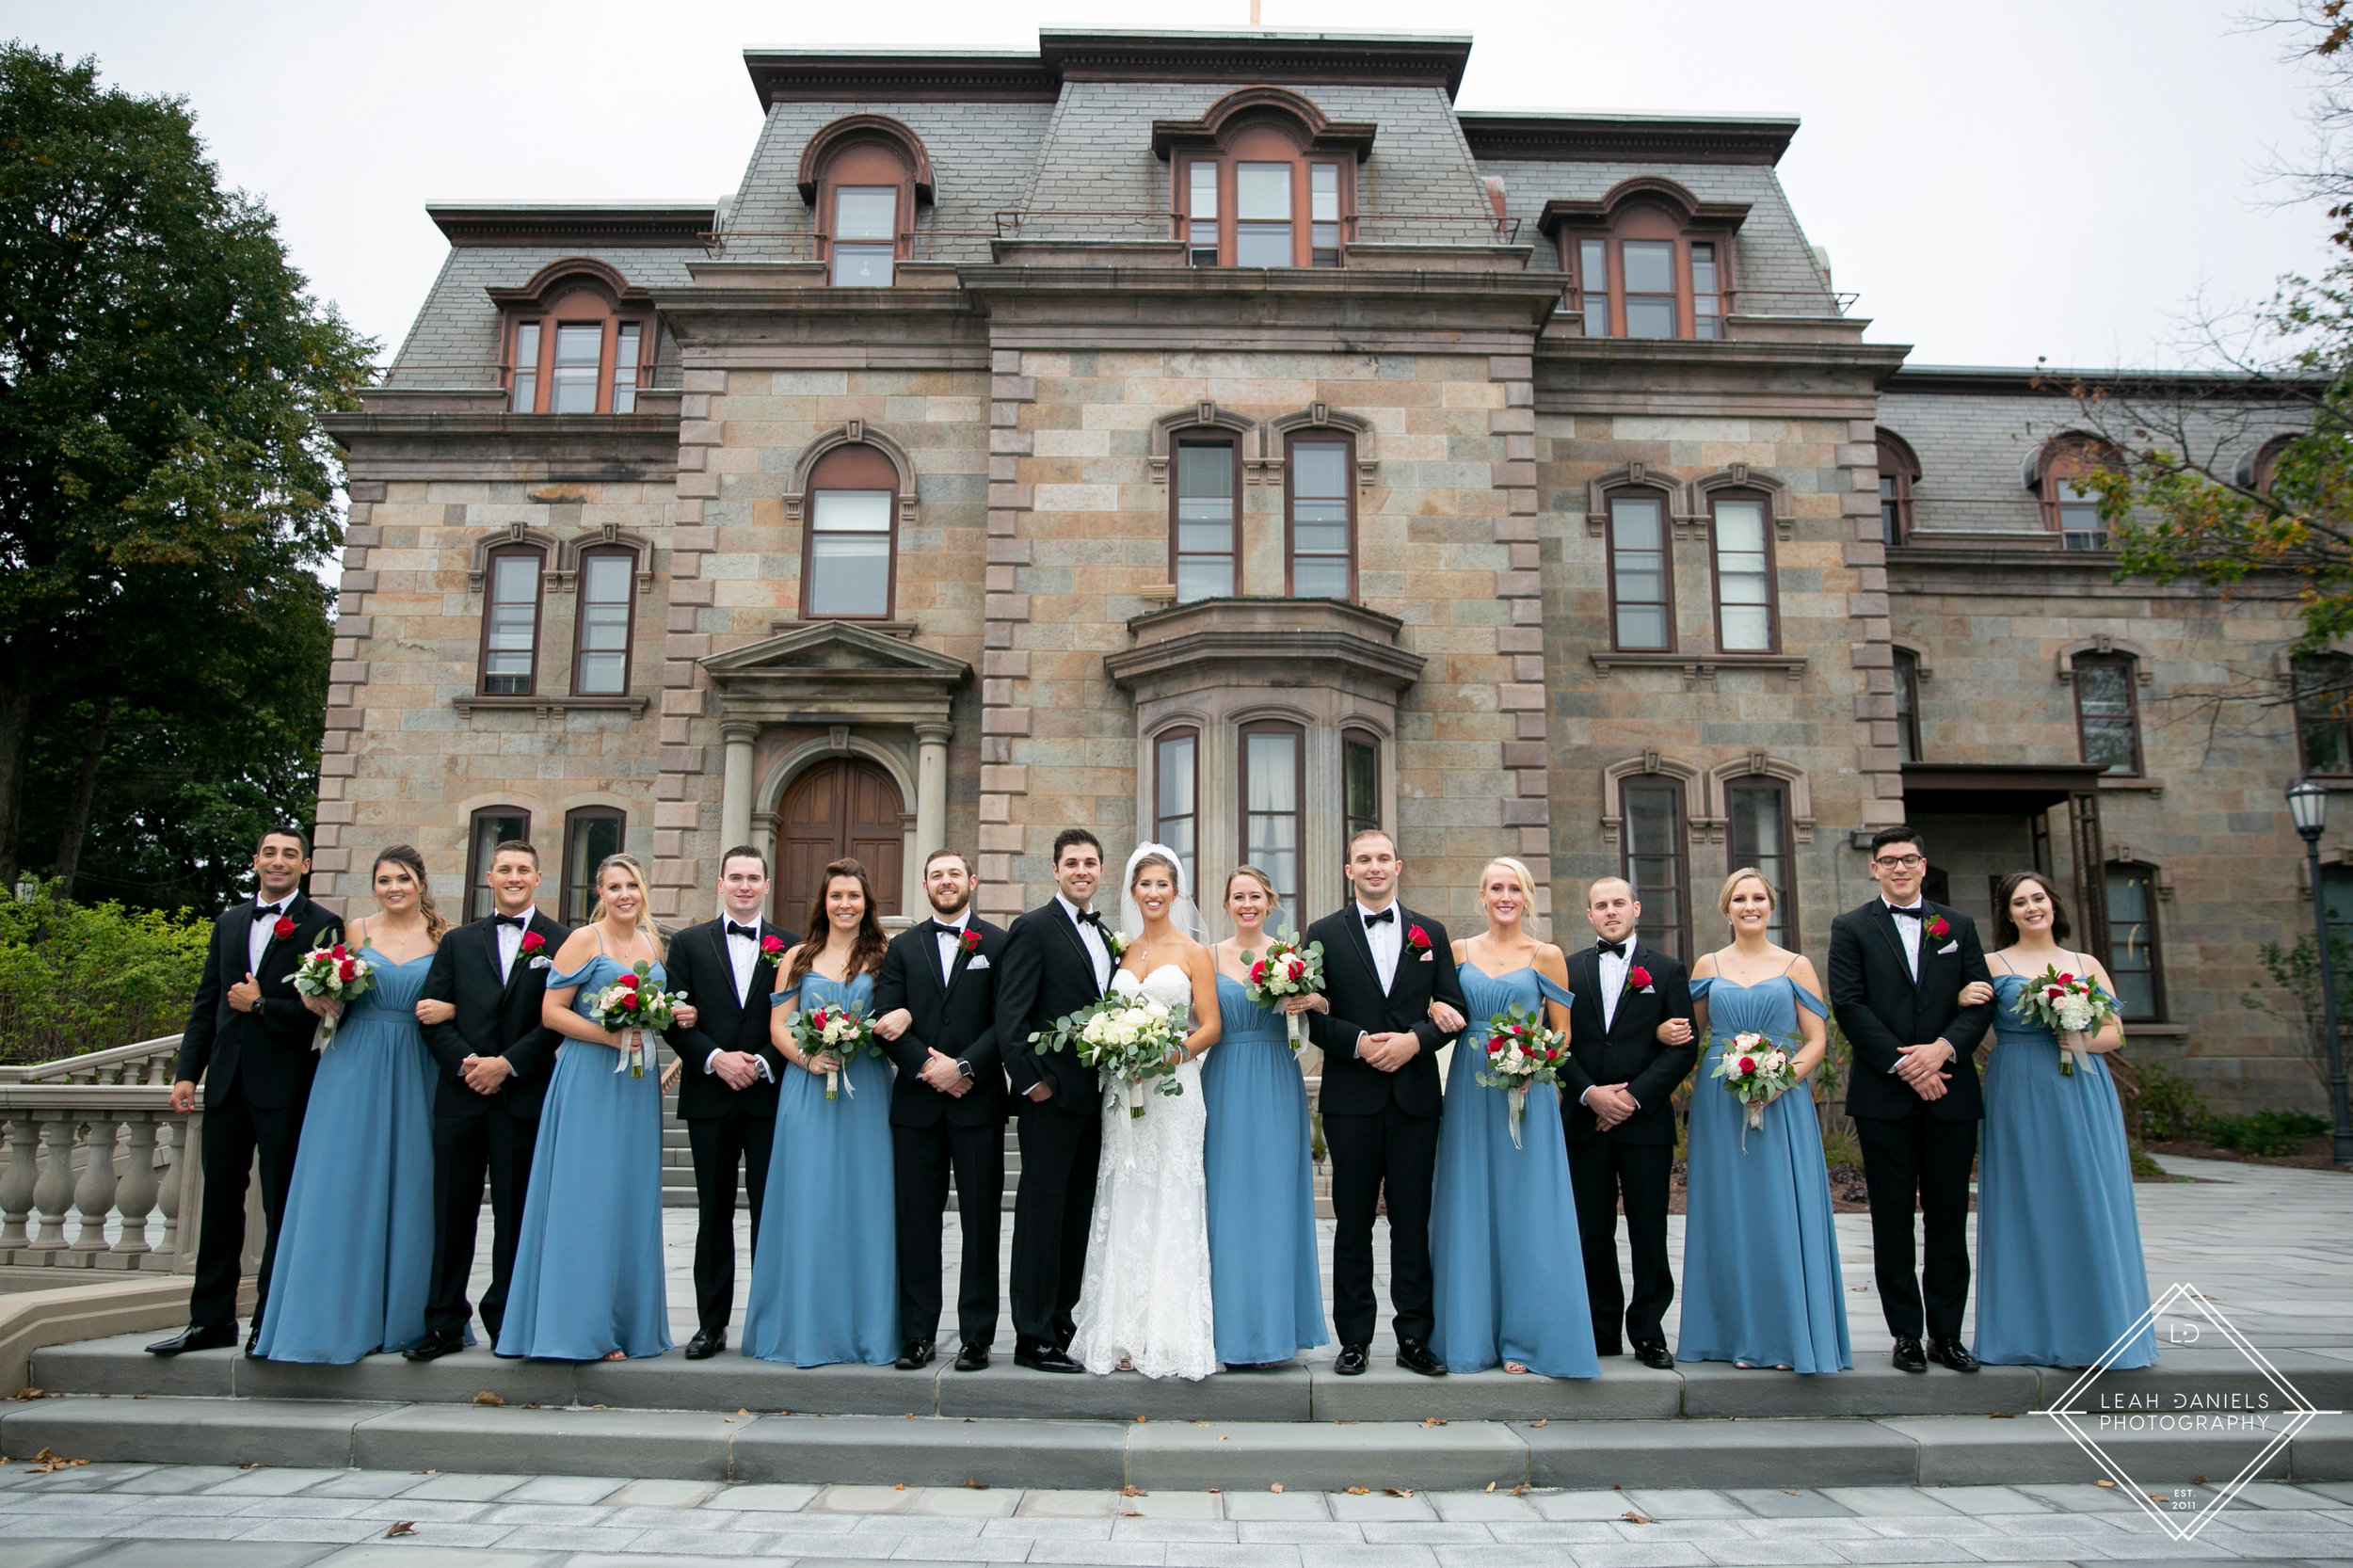 University of Scranton Wedding - The Estate